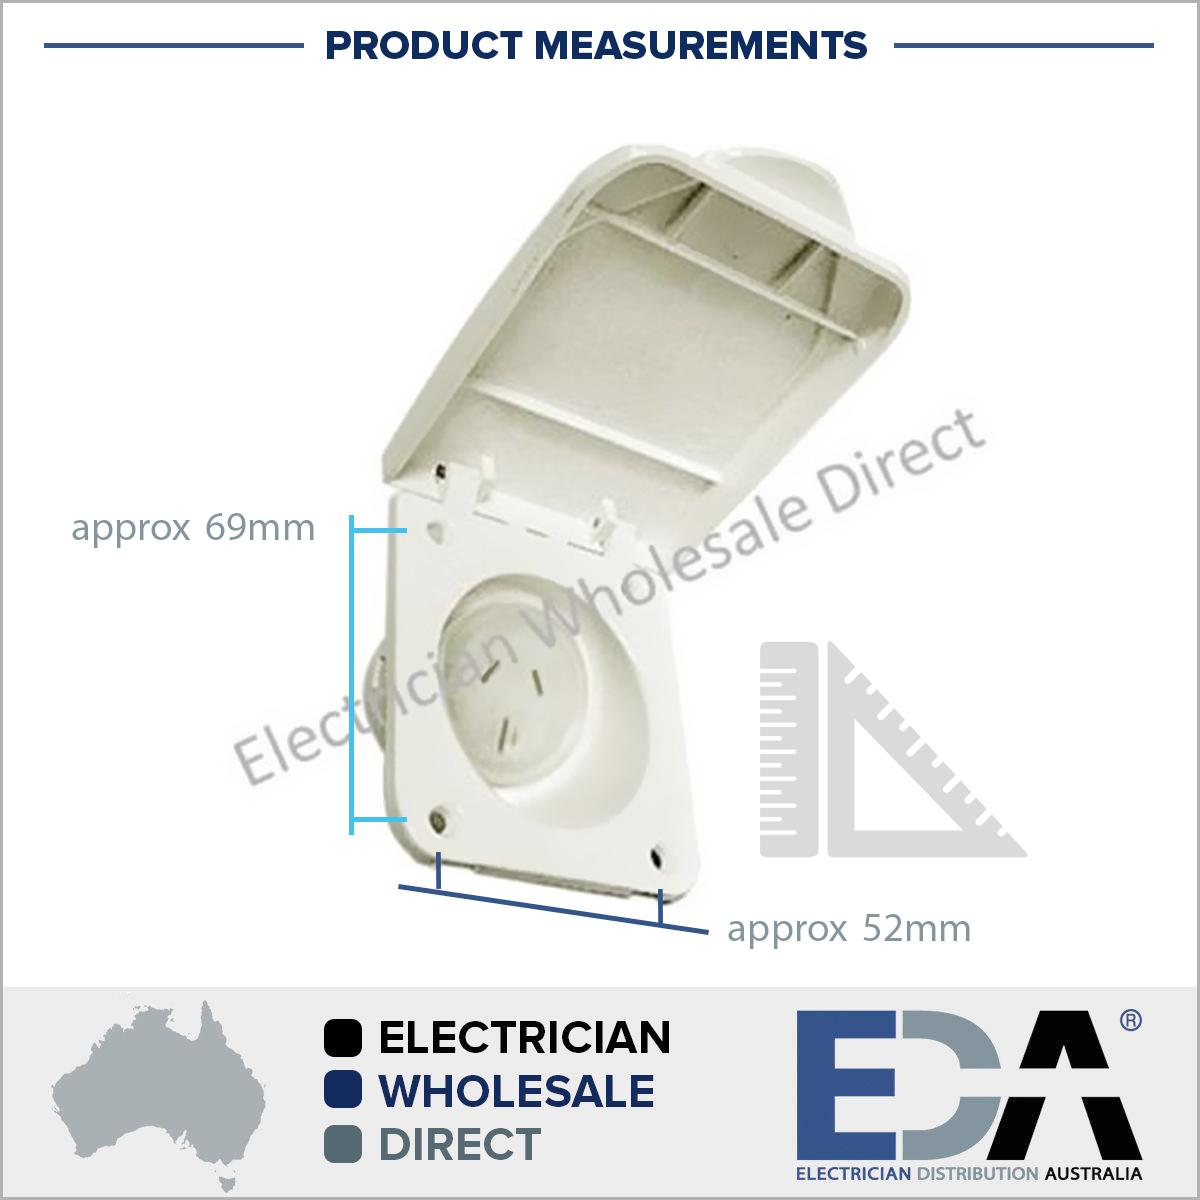 Gfci Wiring Diagram 115v: 15 Amp Power Outlet For Caravan Motor Home And RV 240V